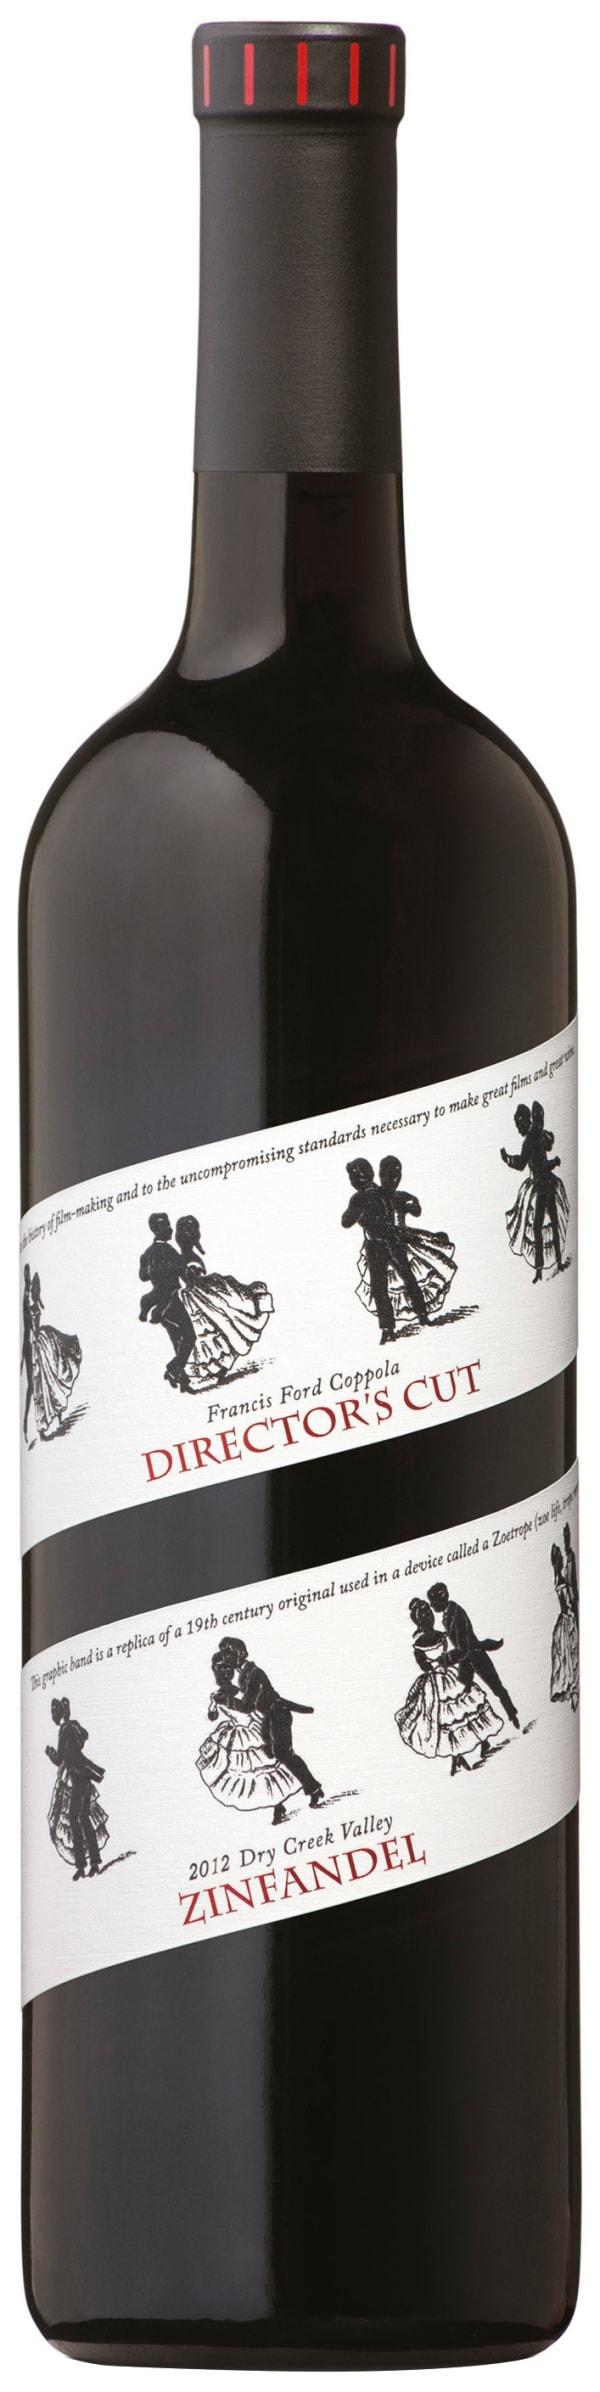 Francis Ford Coppola Director's Cut Zinfandel 2013